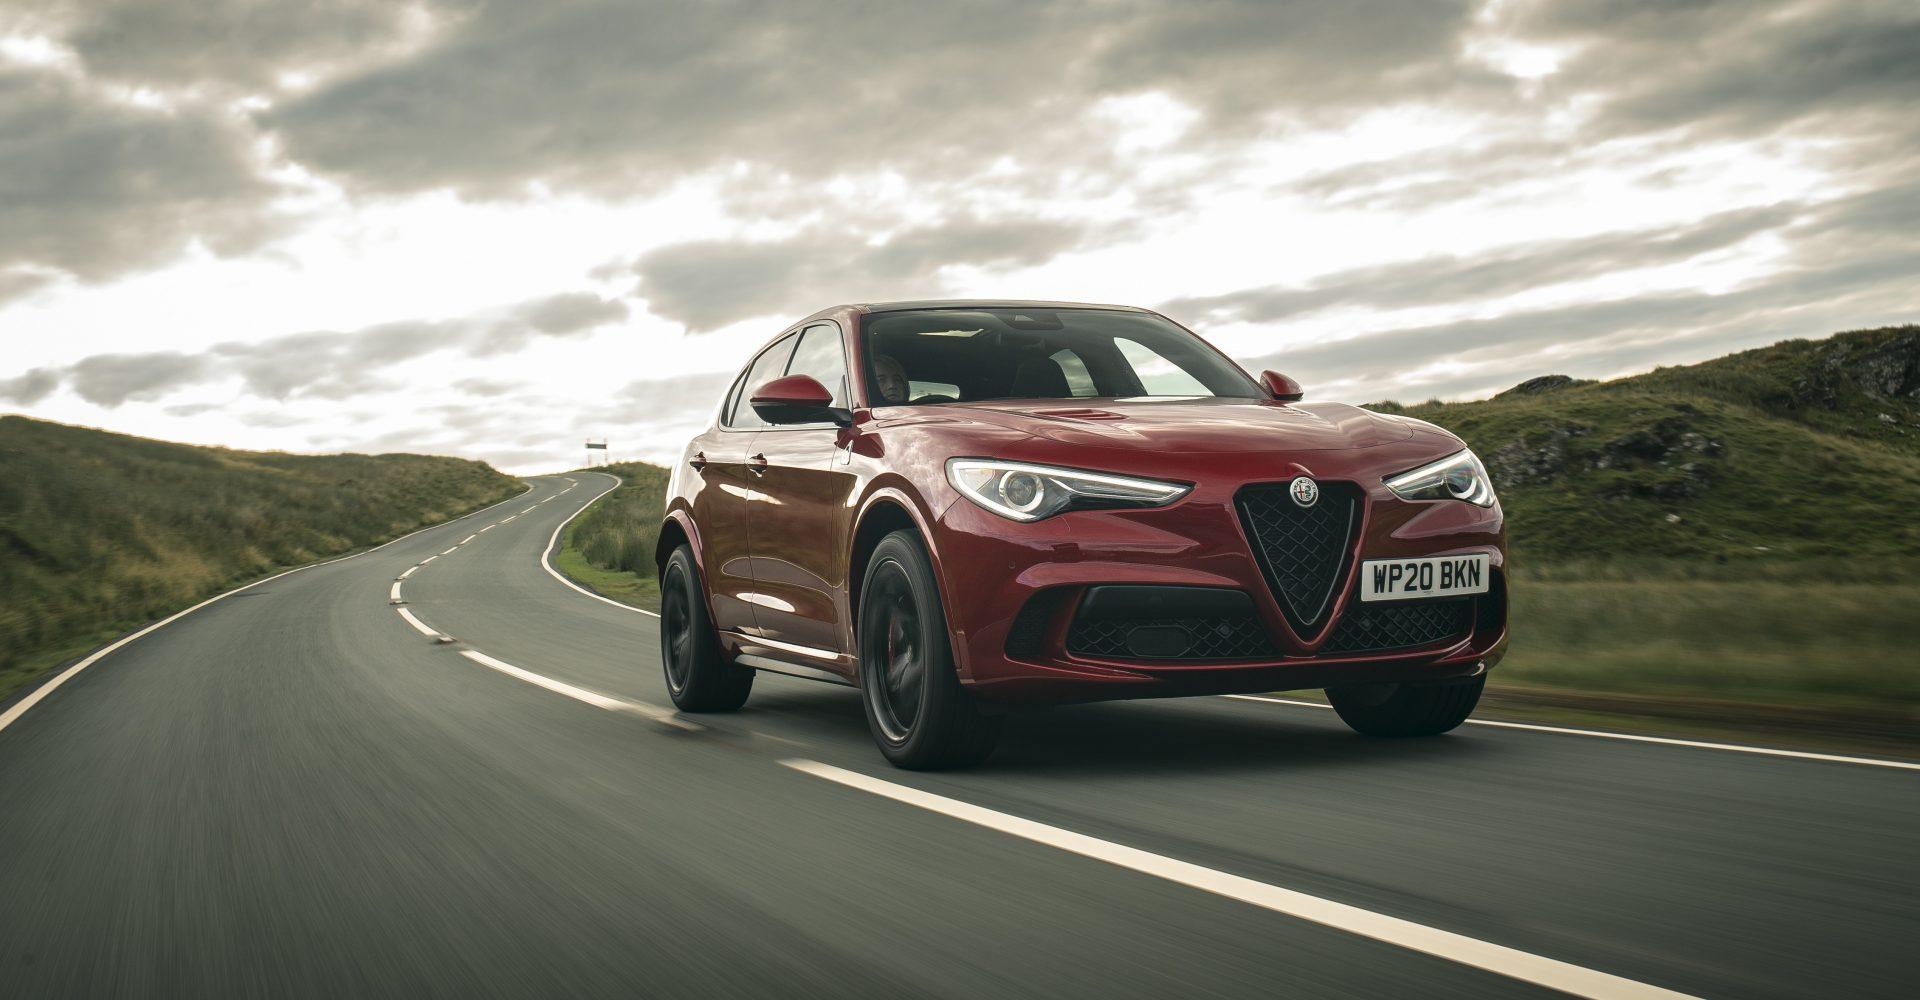 First Drive: Alfa Romeo's updated Stelvio Quadrifoglio is sharper than ever